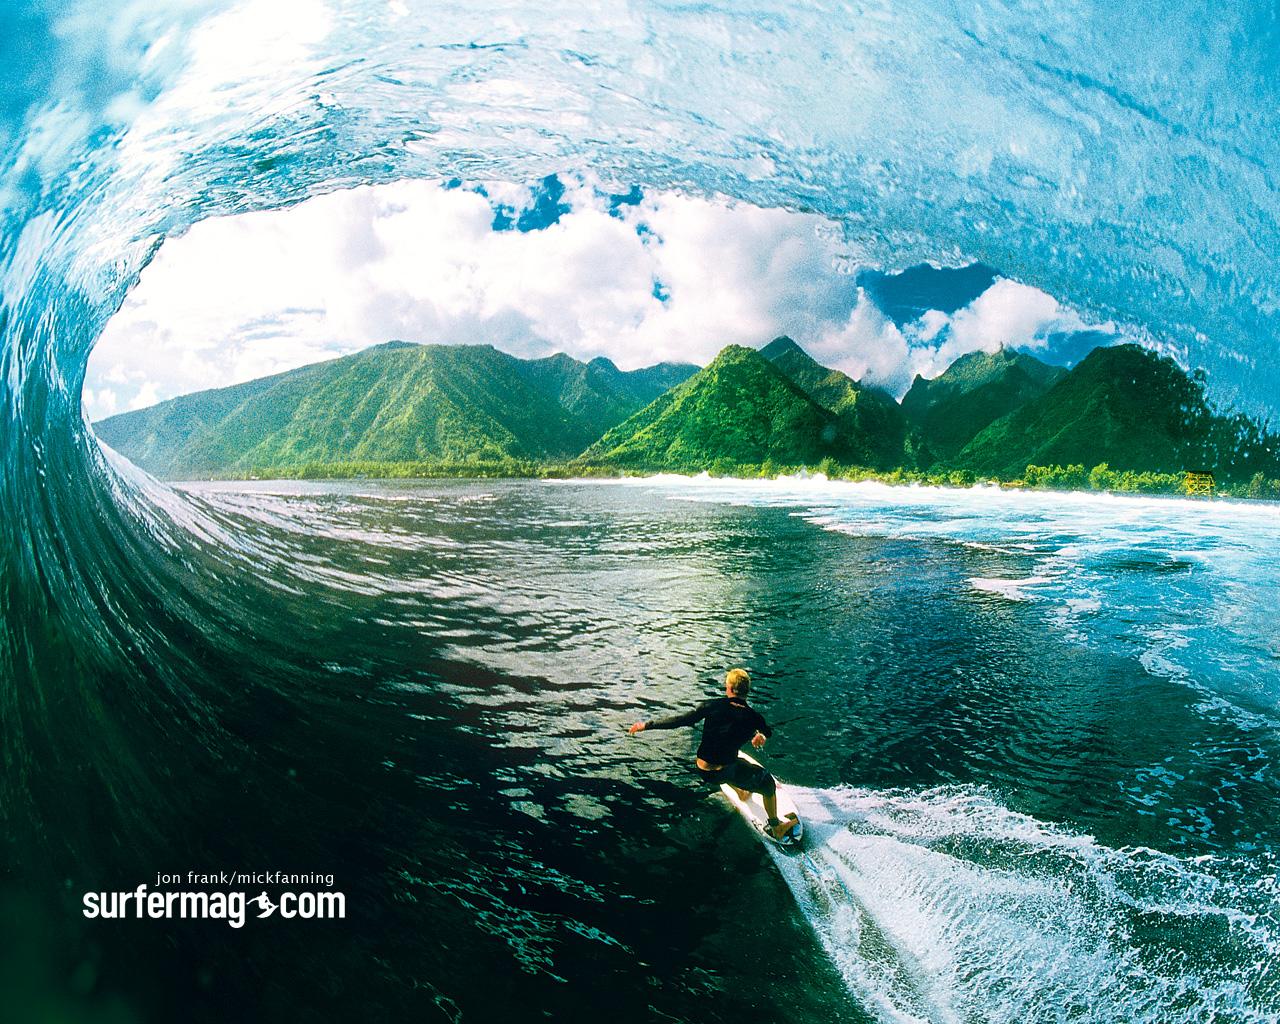 surfing surfingjpg   535778   Image Hosting at TurboImageHost 1280x1024